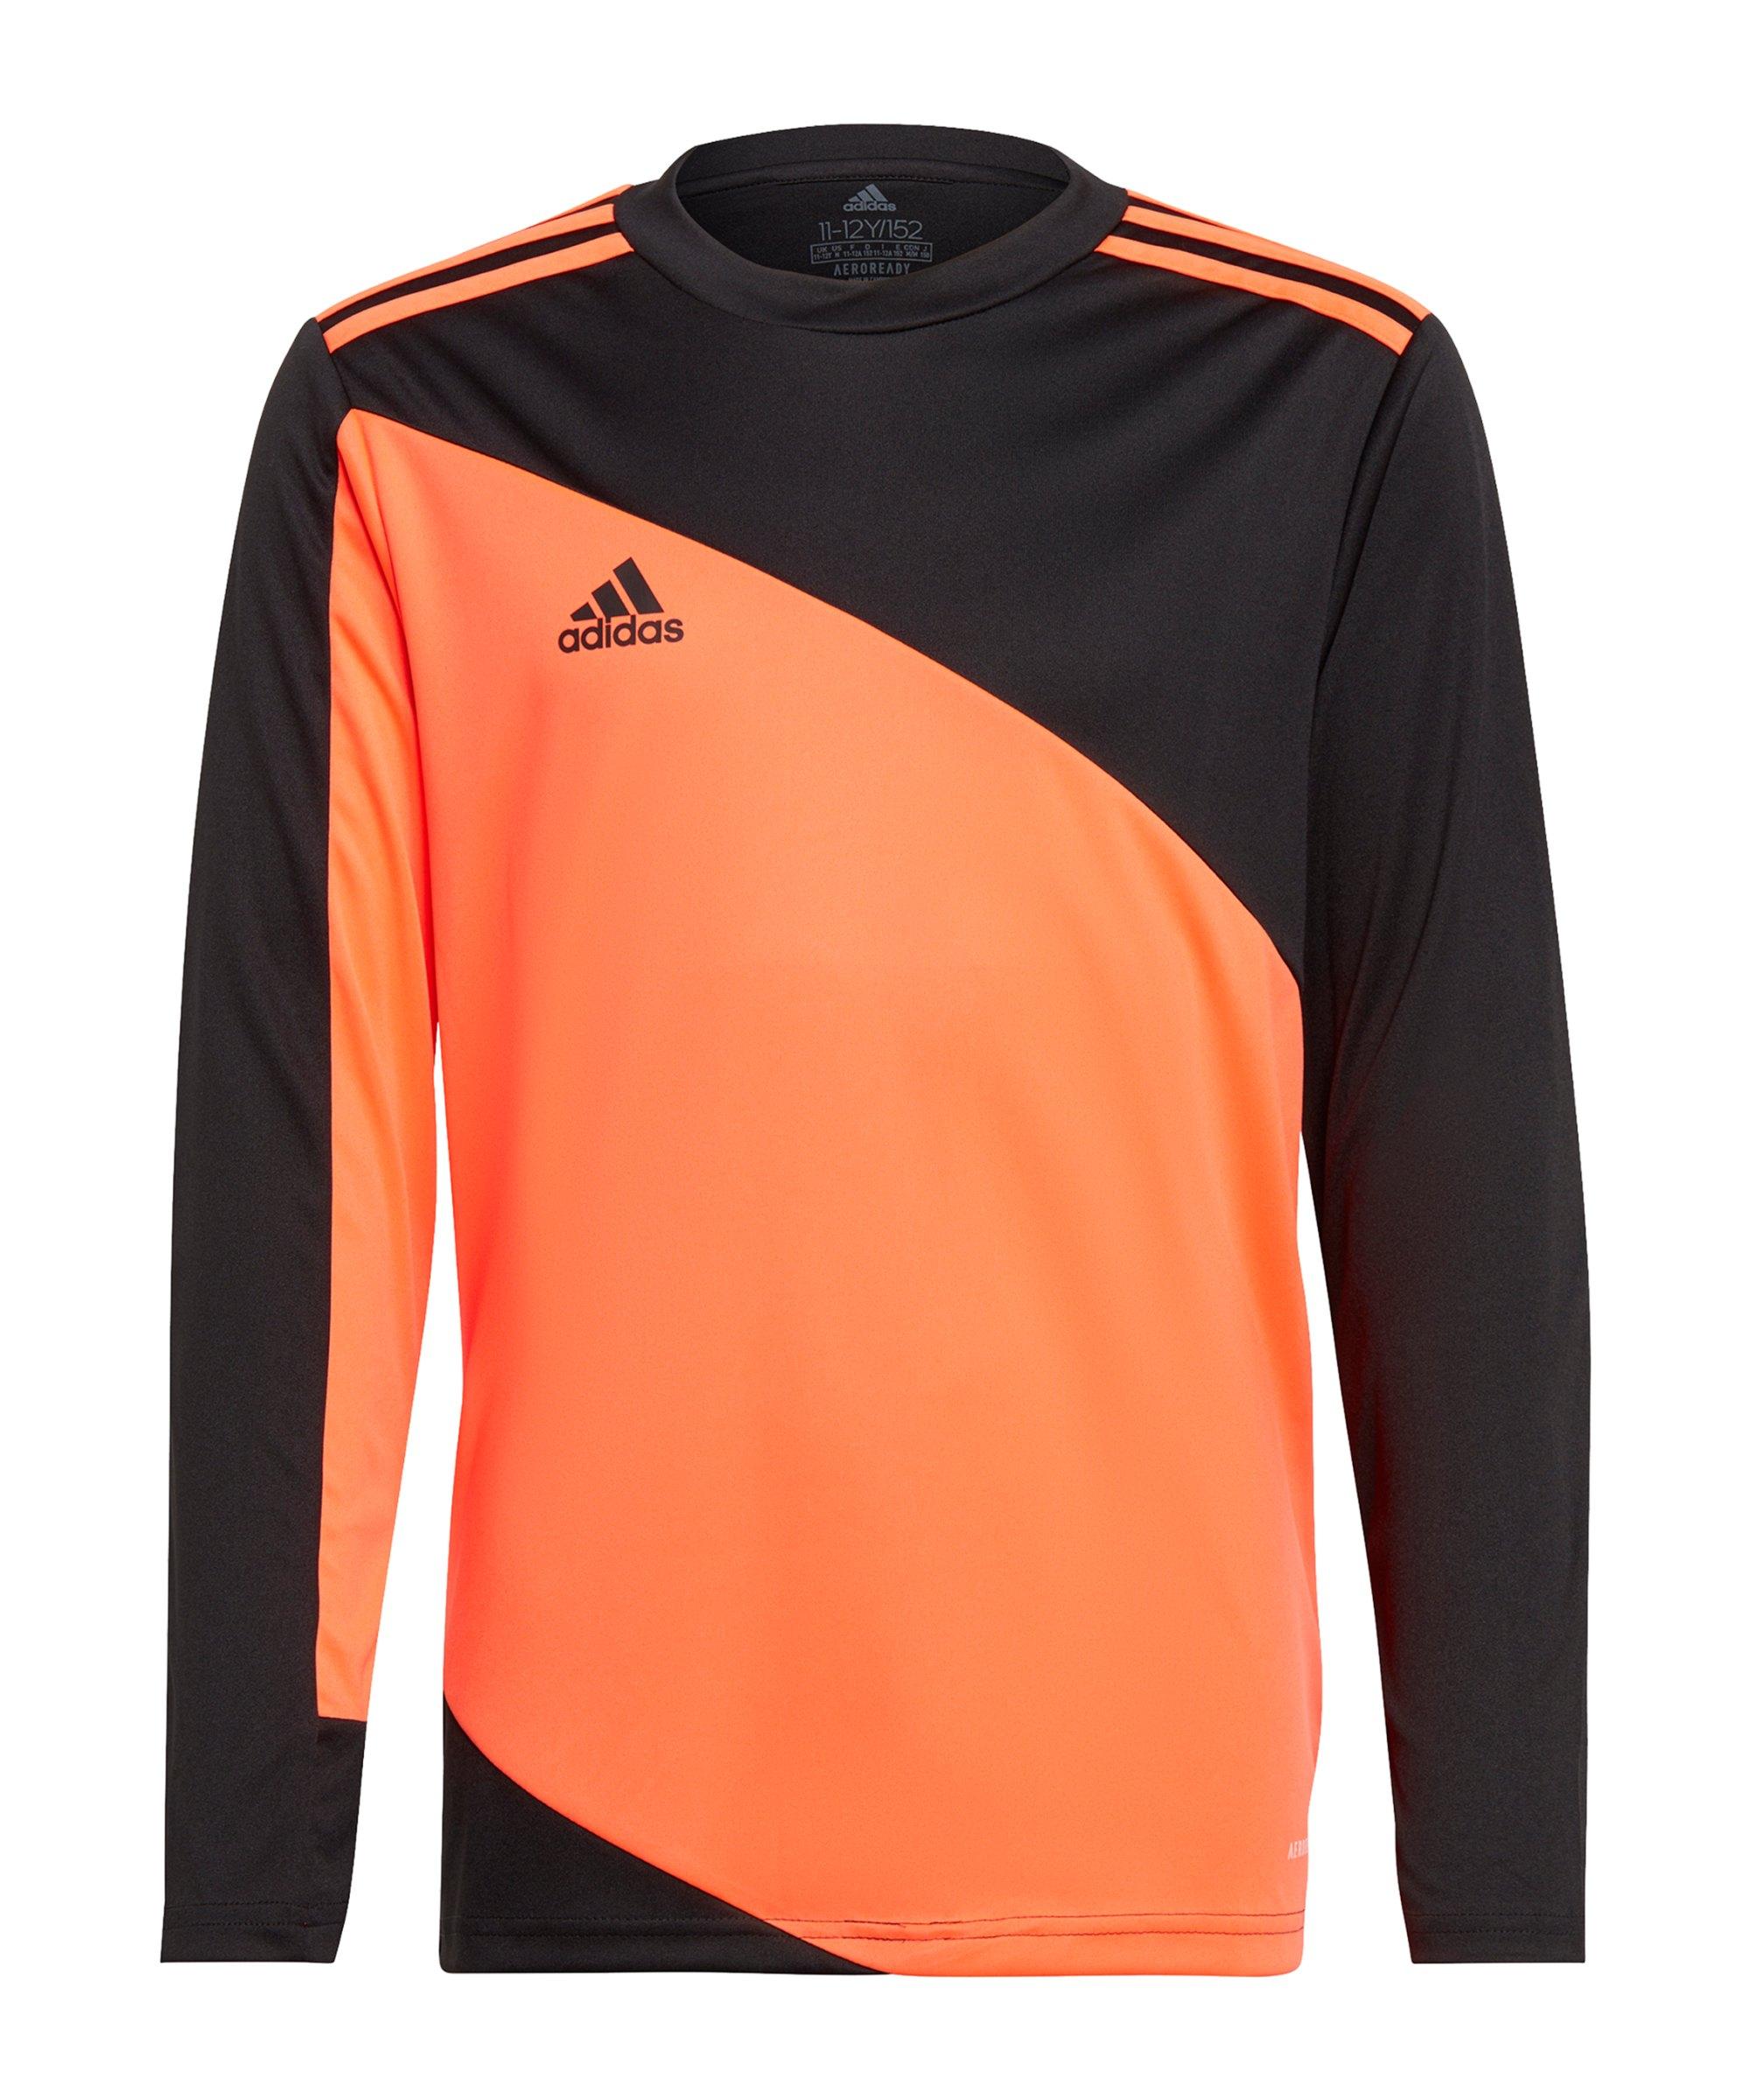 adidas Squadra 21 Torwarttrikot Kids Schwarz Rot - orange